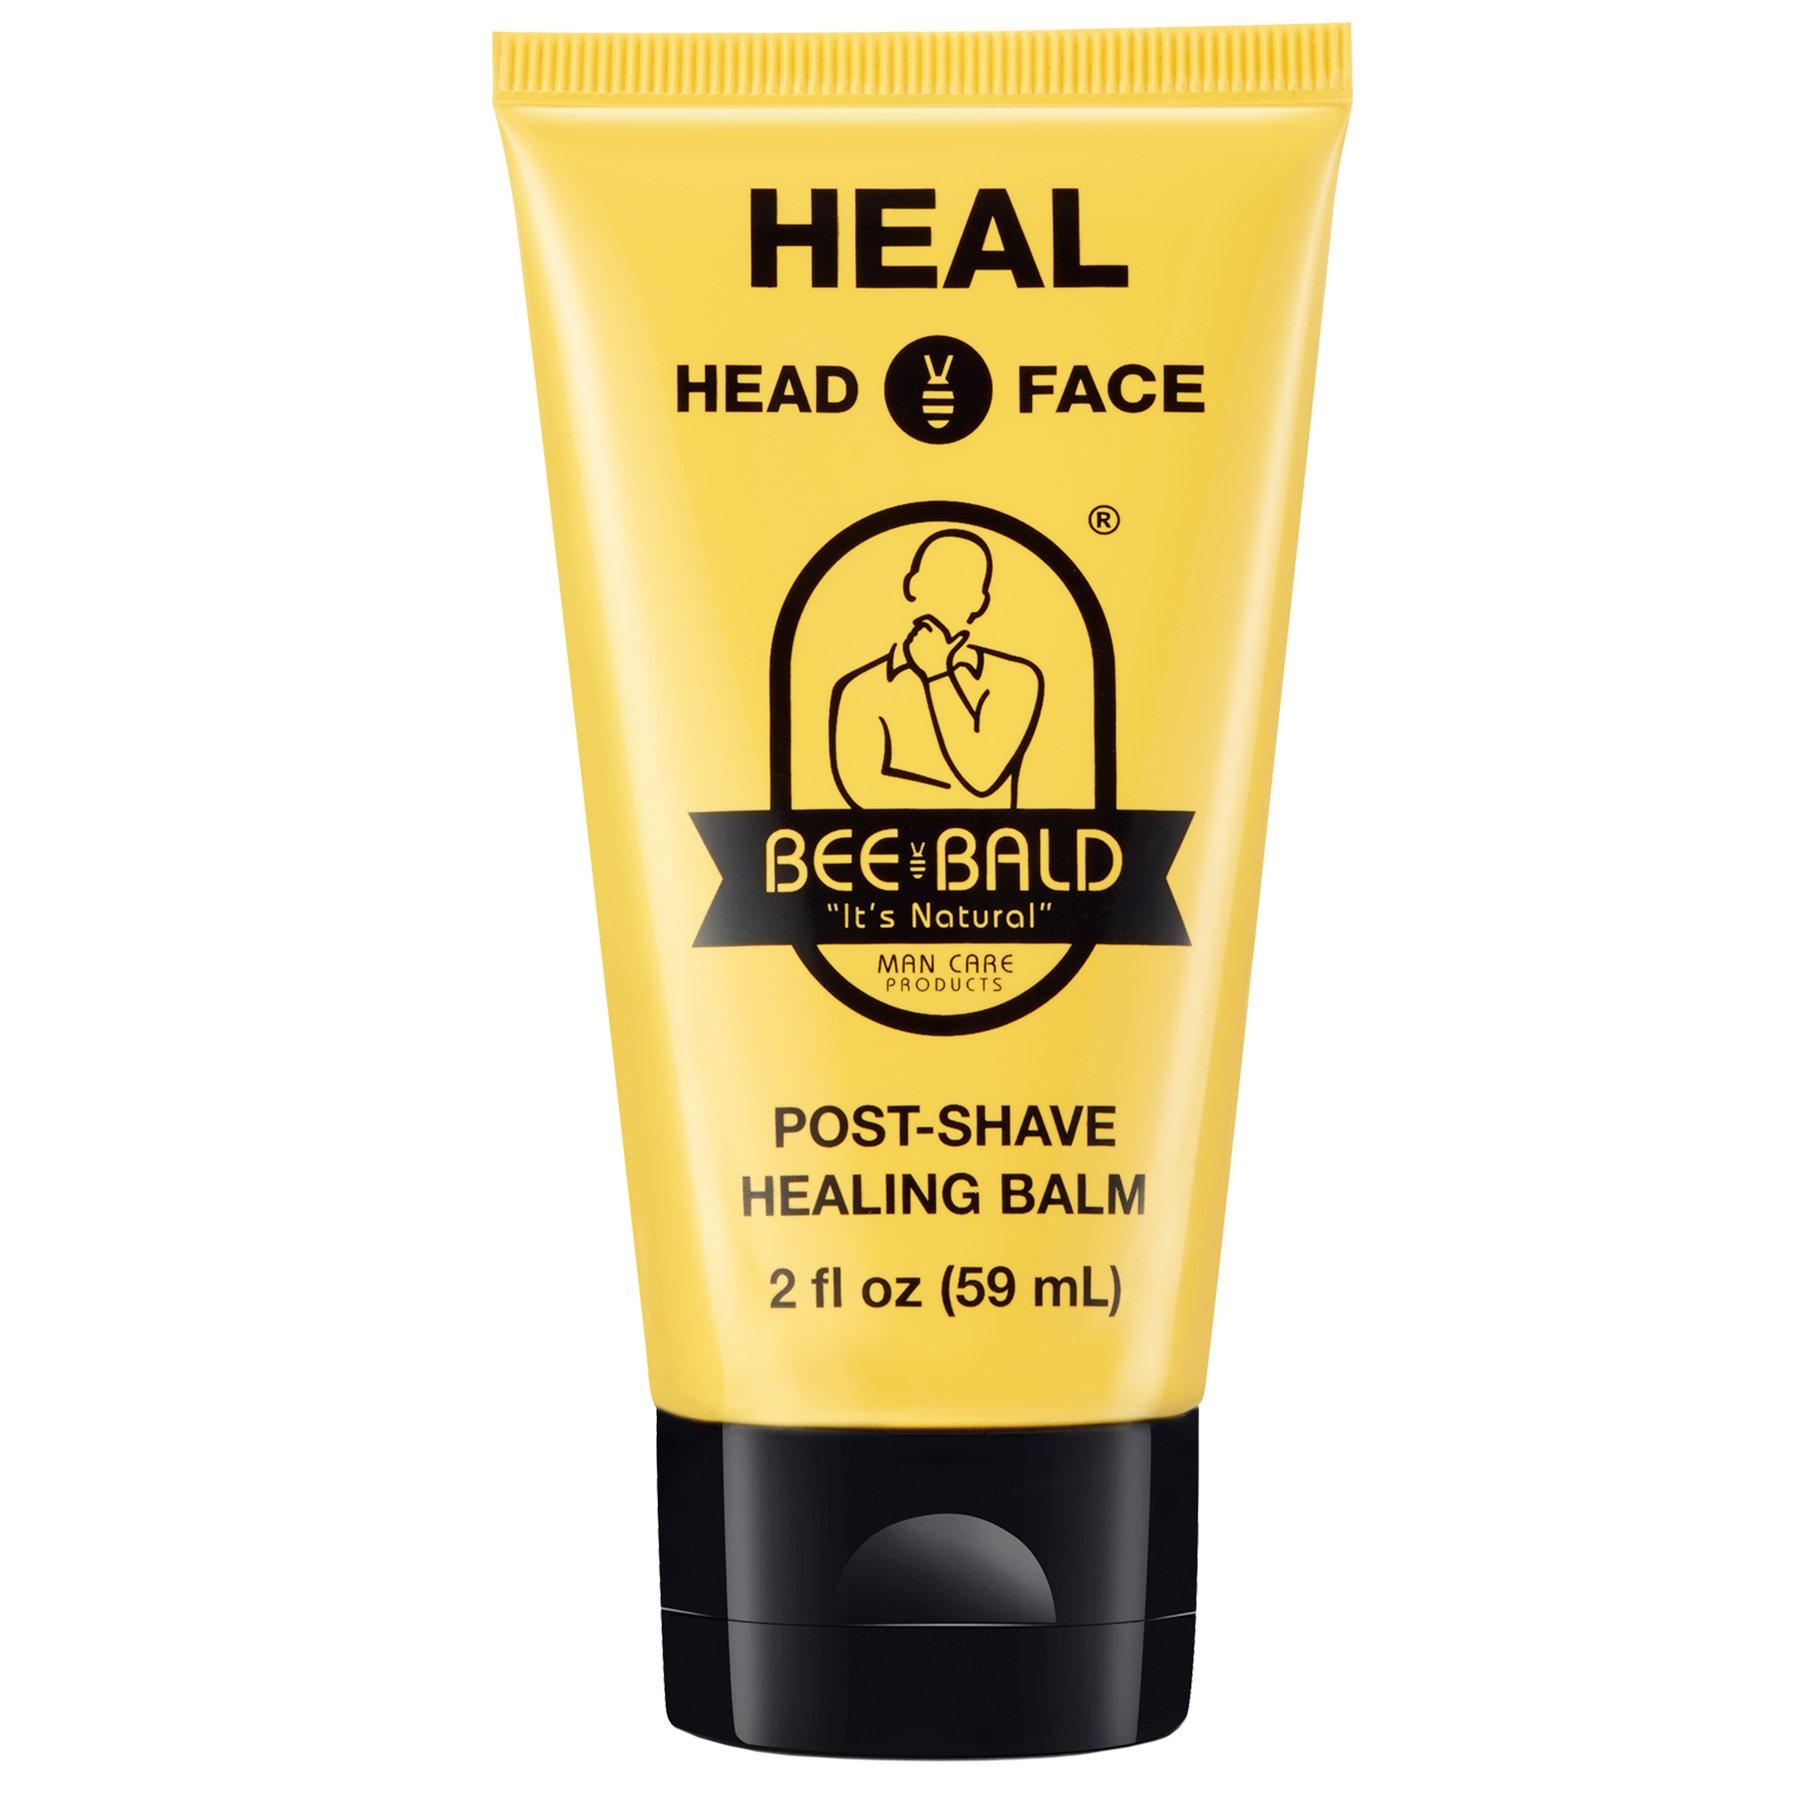 Bee Bald HEAL Post-Shave Healing Balm (2 fl oz)